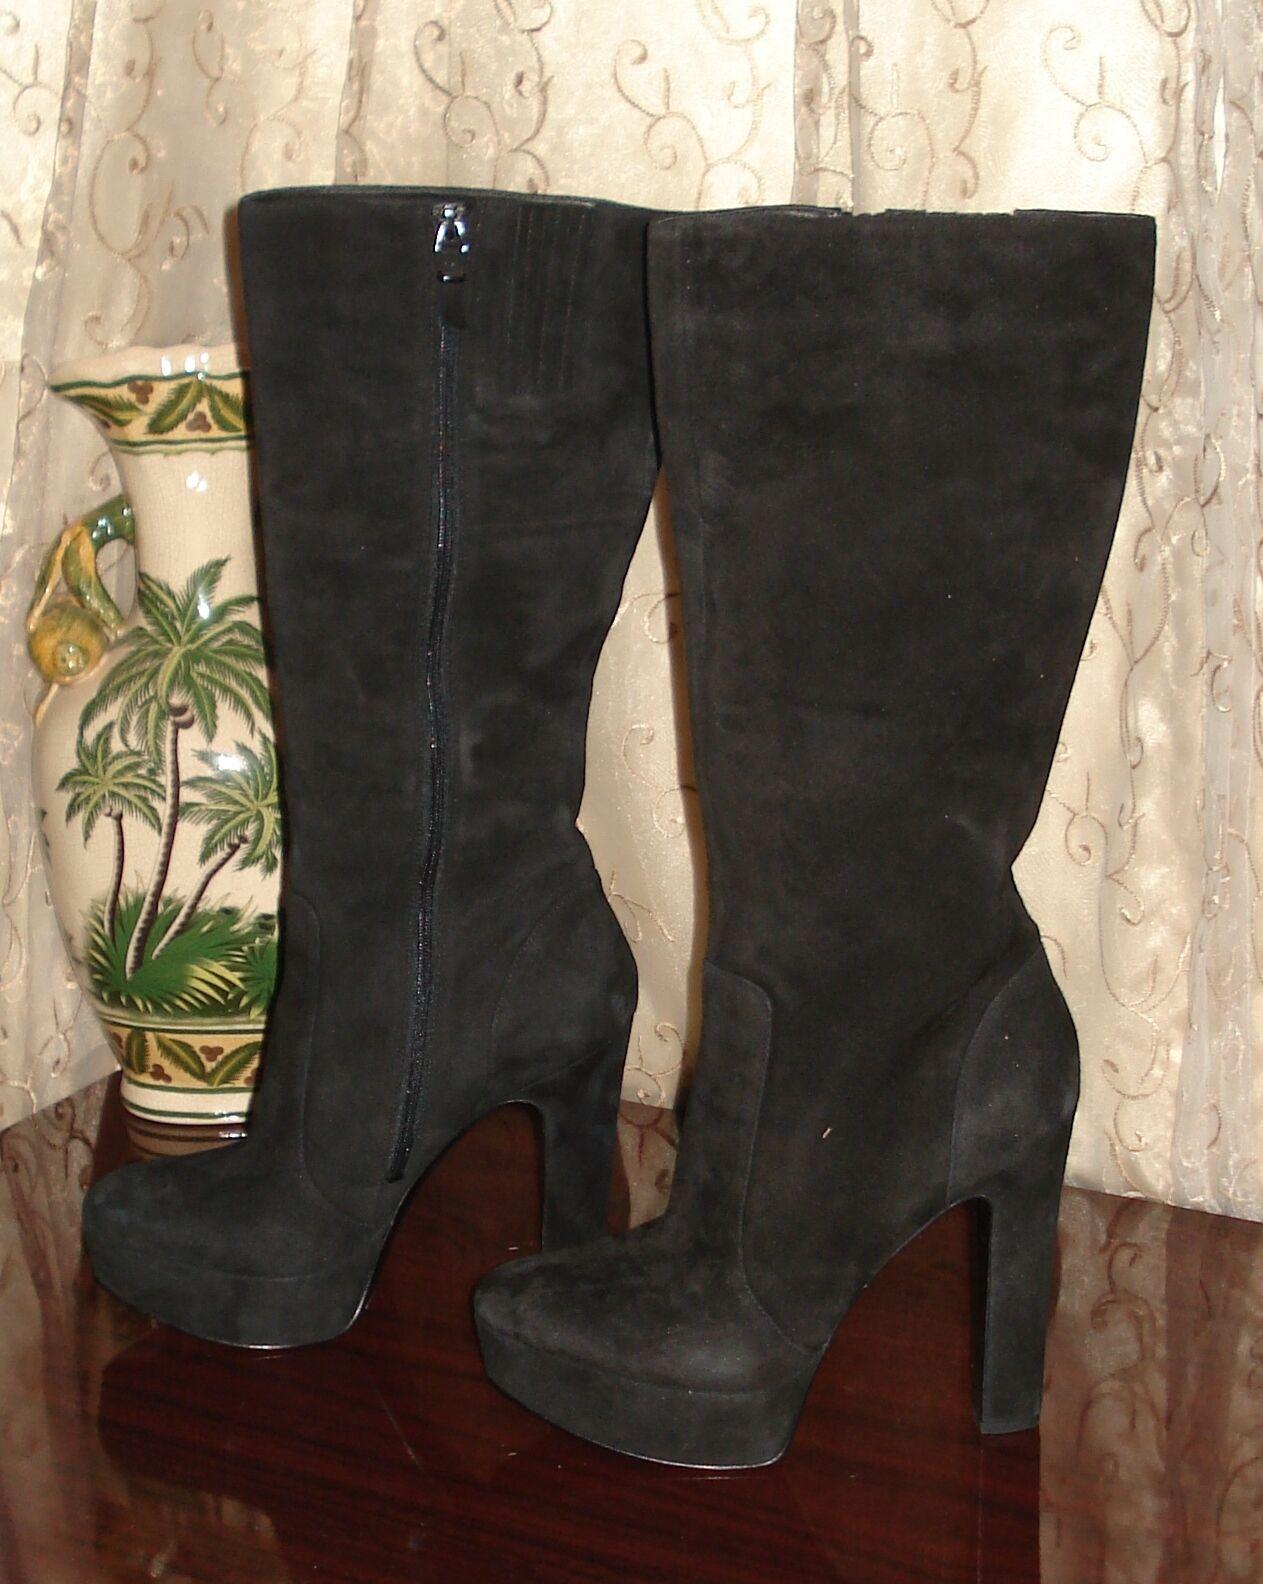 botas De Plataforma De Gamuza Negra (Stevie (Stevie (Stevie Nicks Fleetwood Mac)  punto de venta